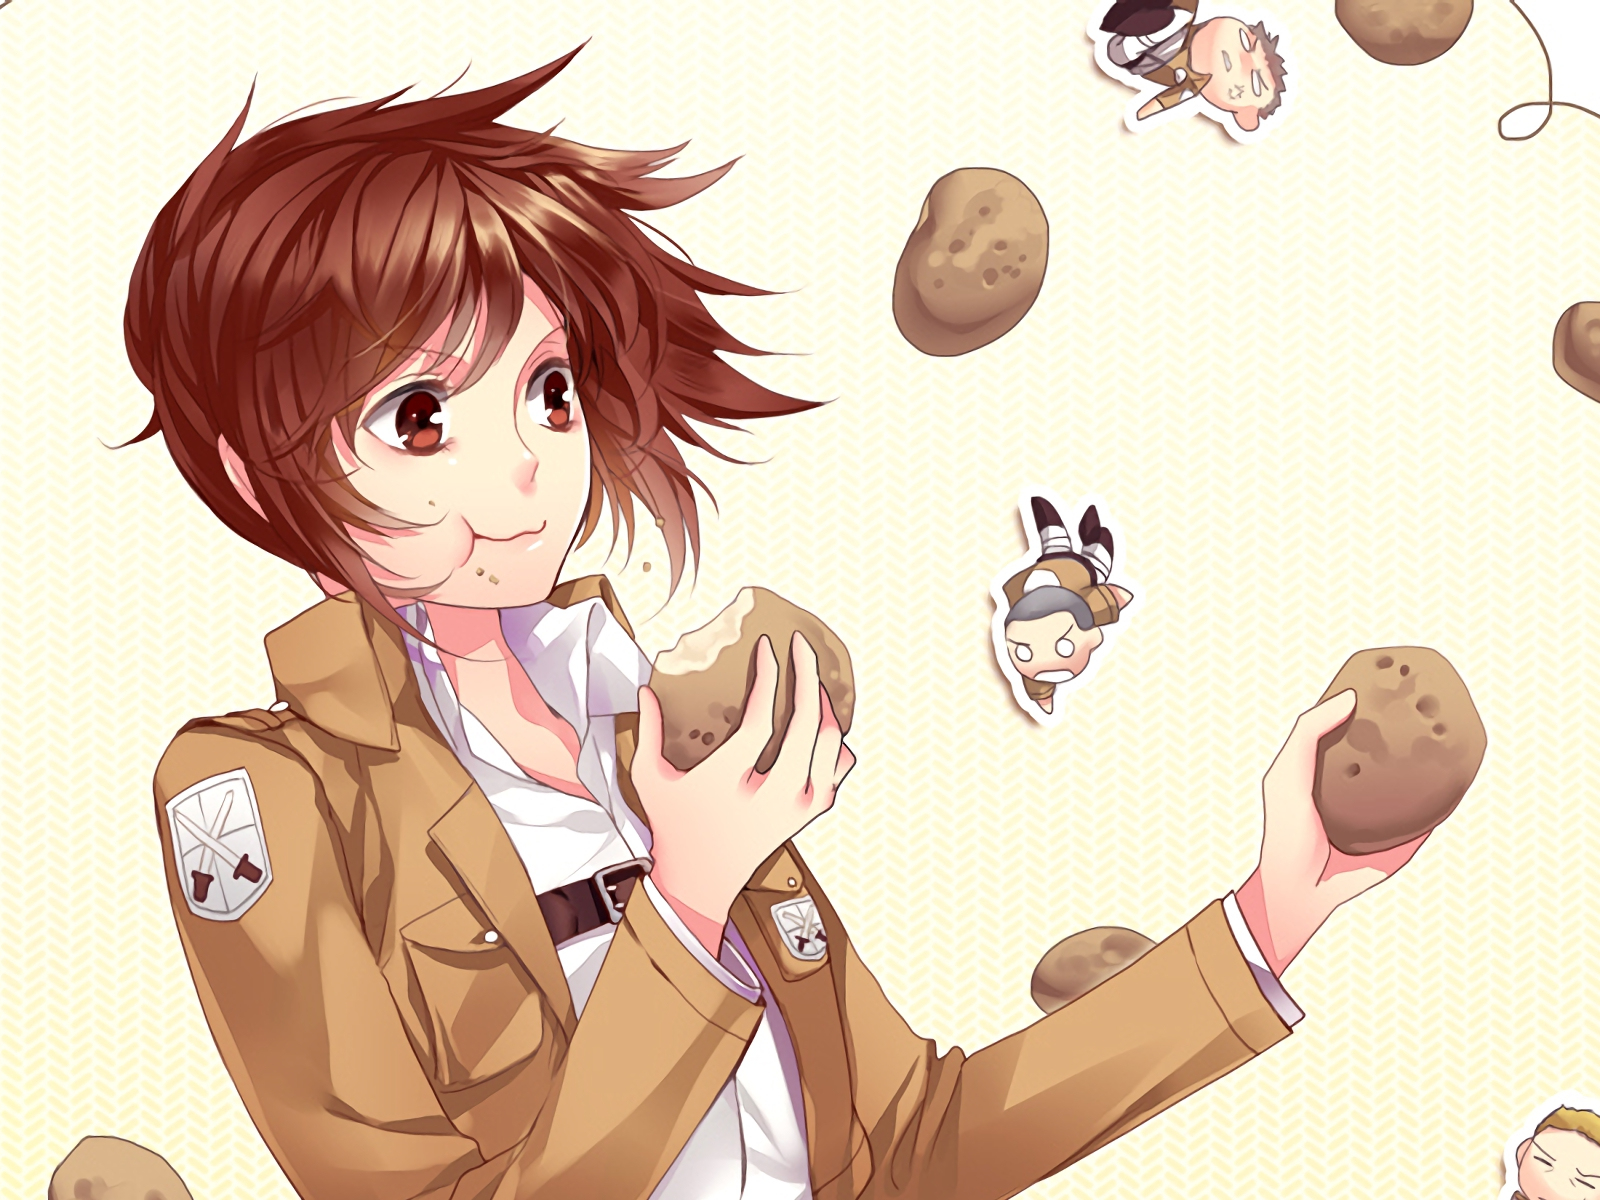 Desktop Wallpaper Sasha Blouse Sasha Braus Attack On Titan Eating Anime Girl Hd Image Picture Background Suo 1z